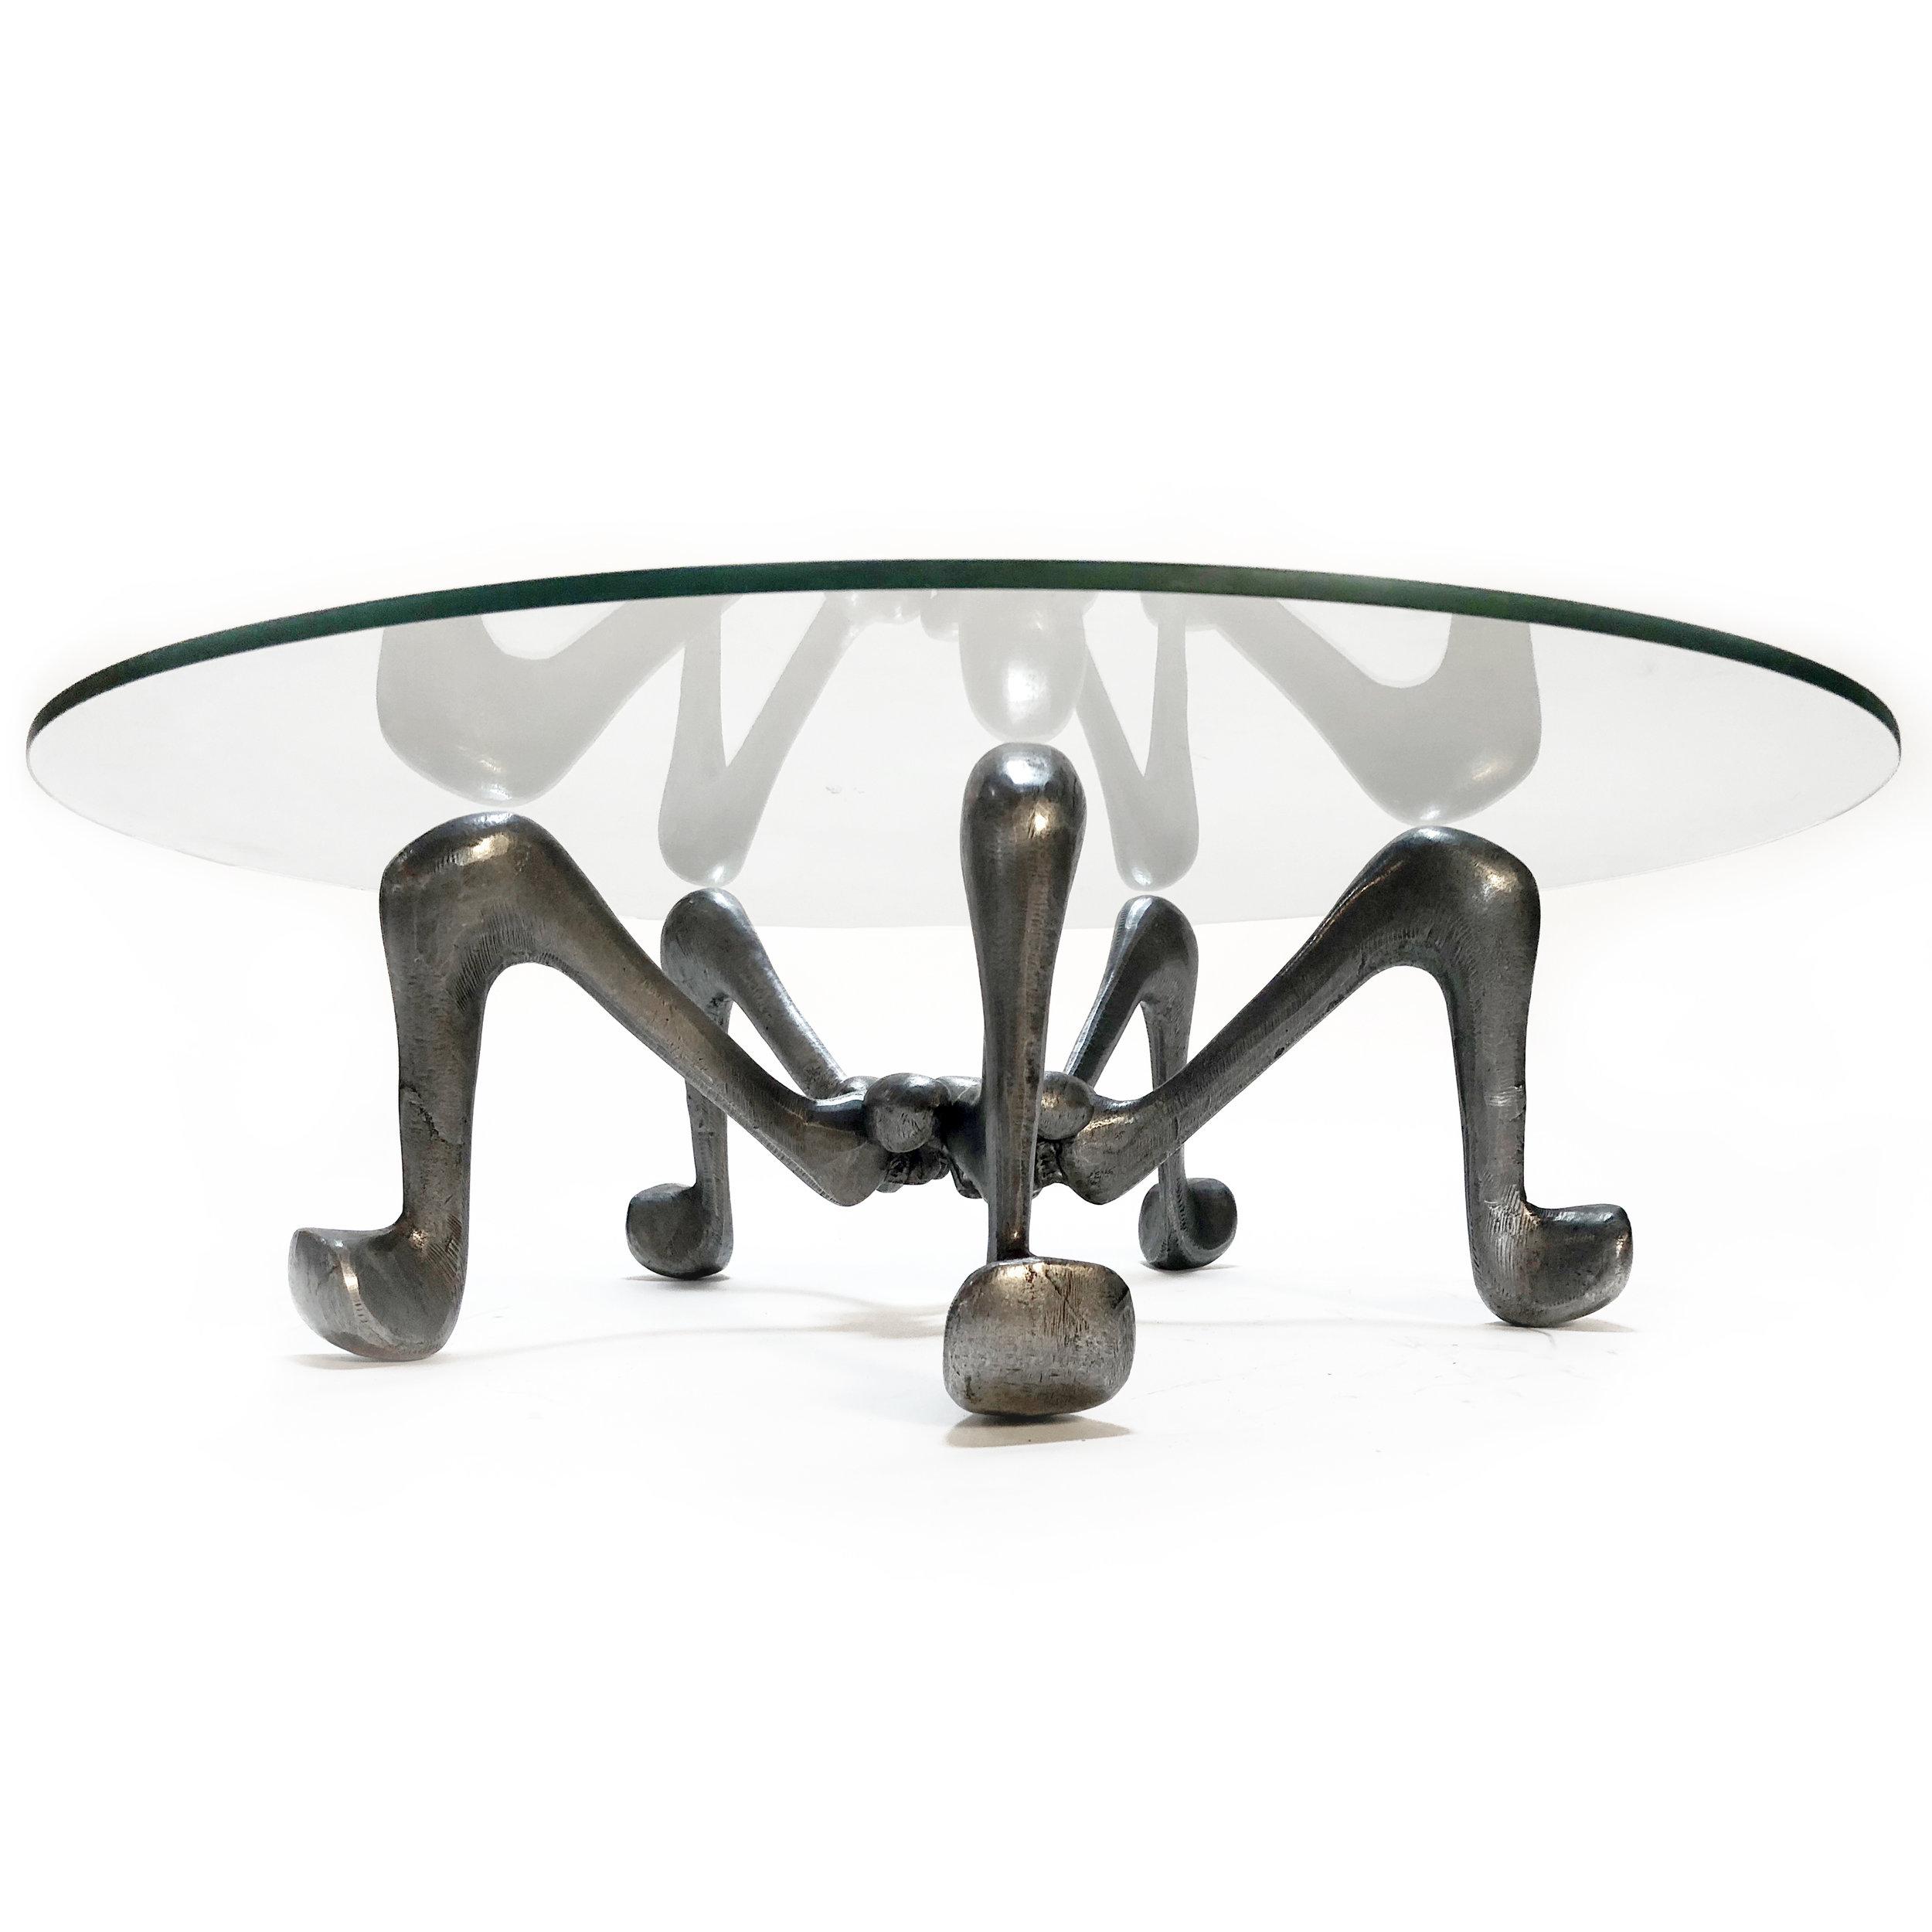 Ashtenputtel Table - Worms Eye.jpg